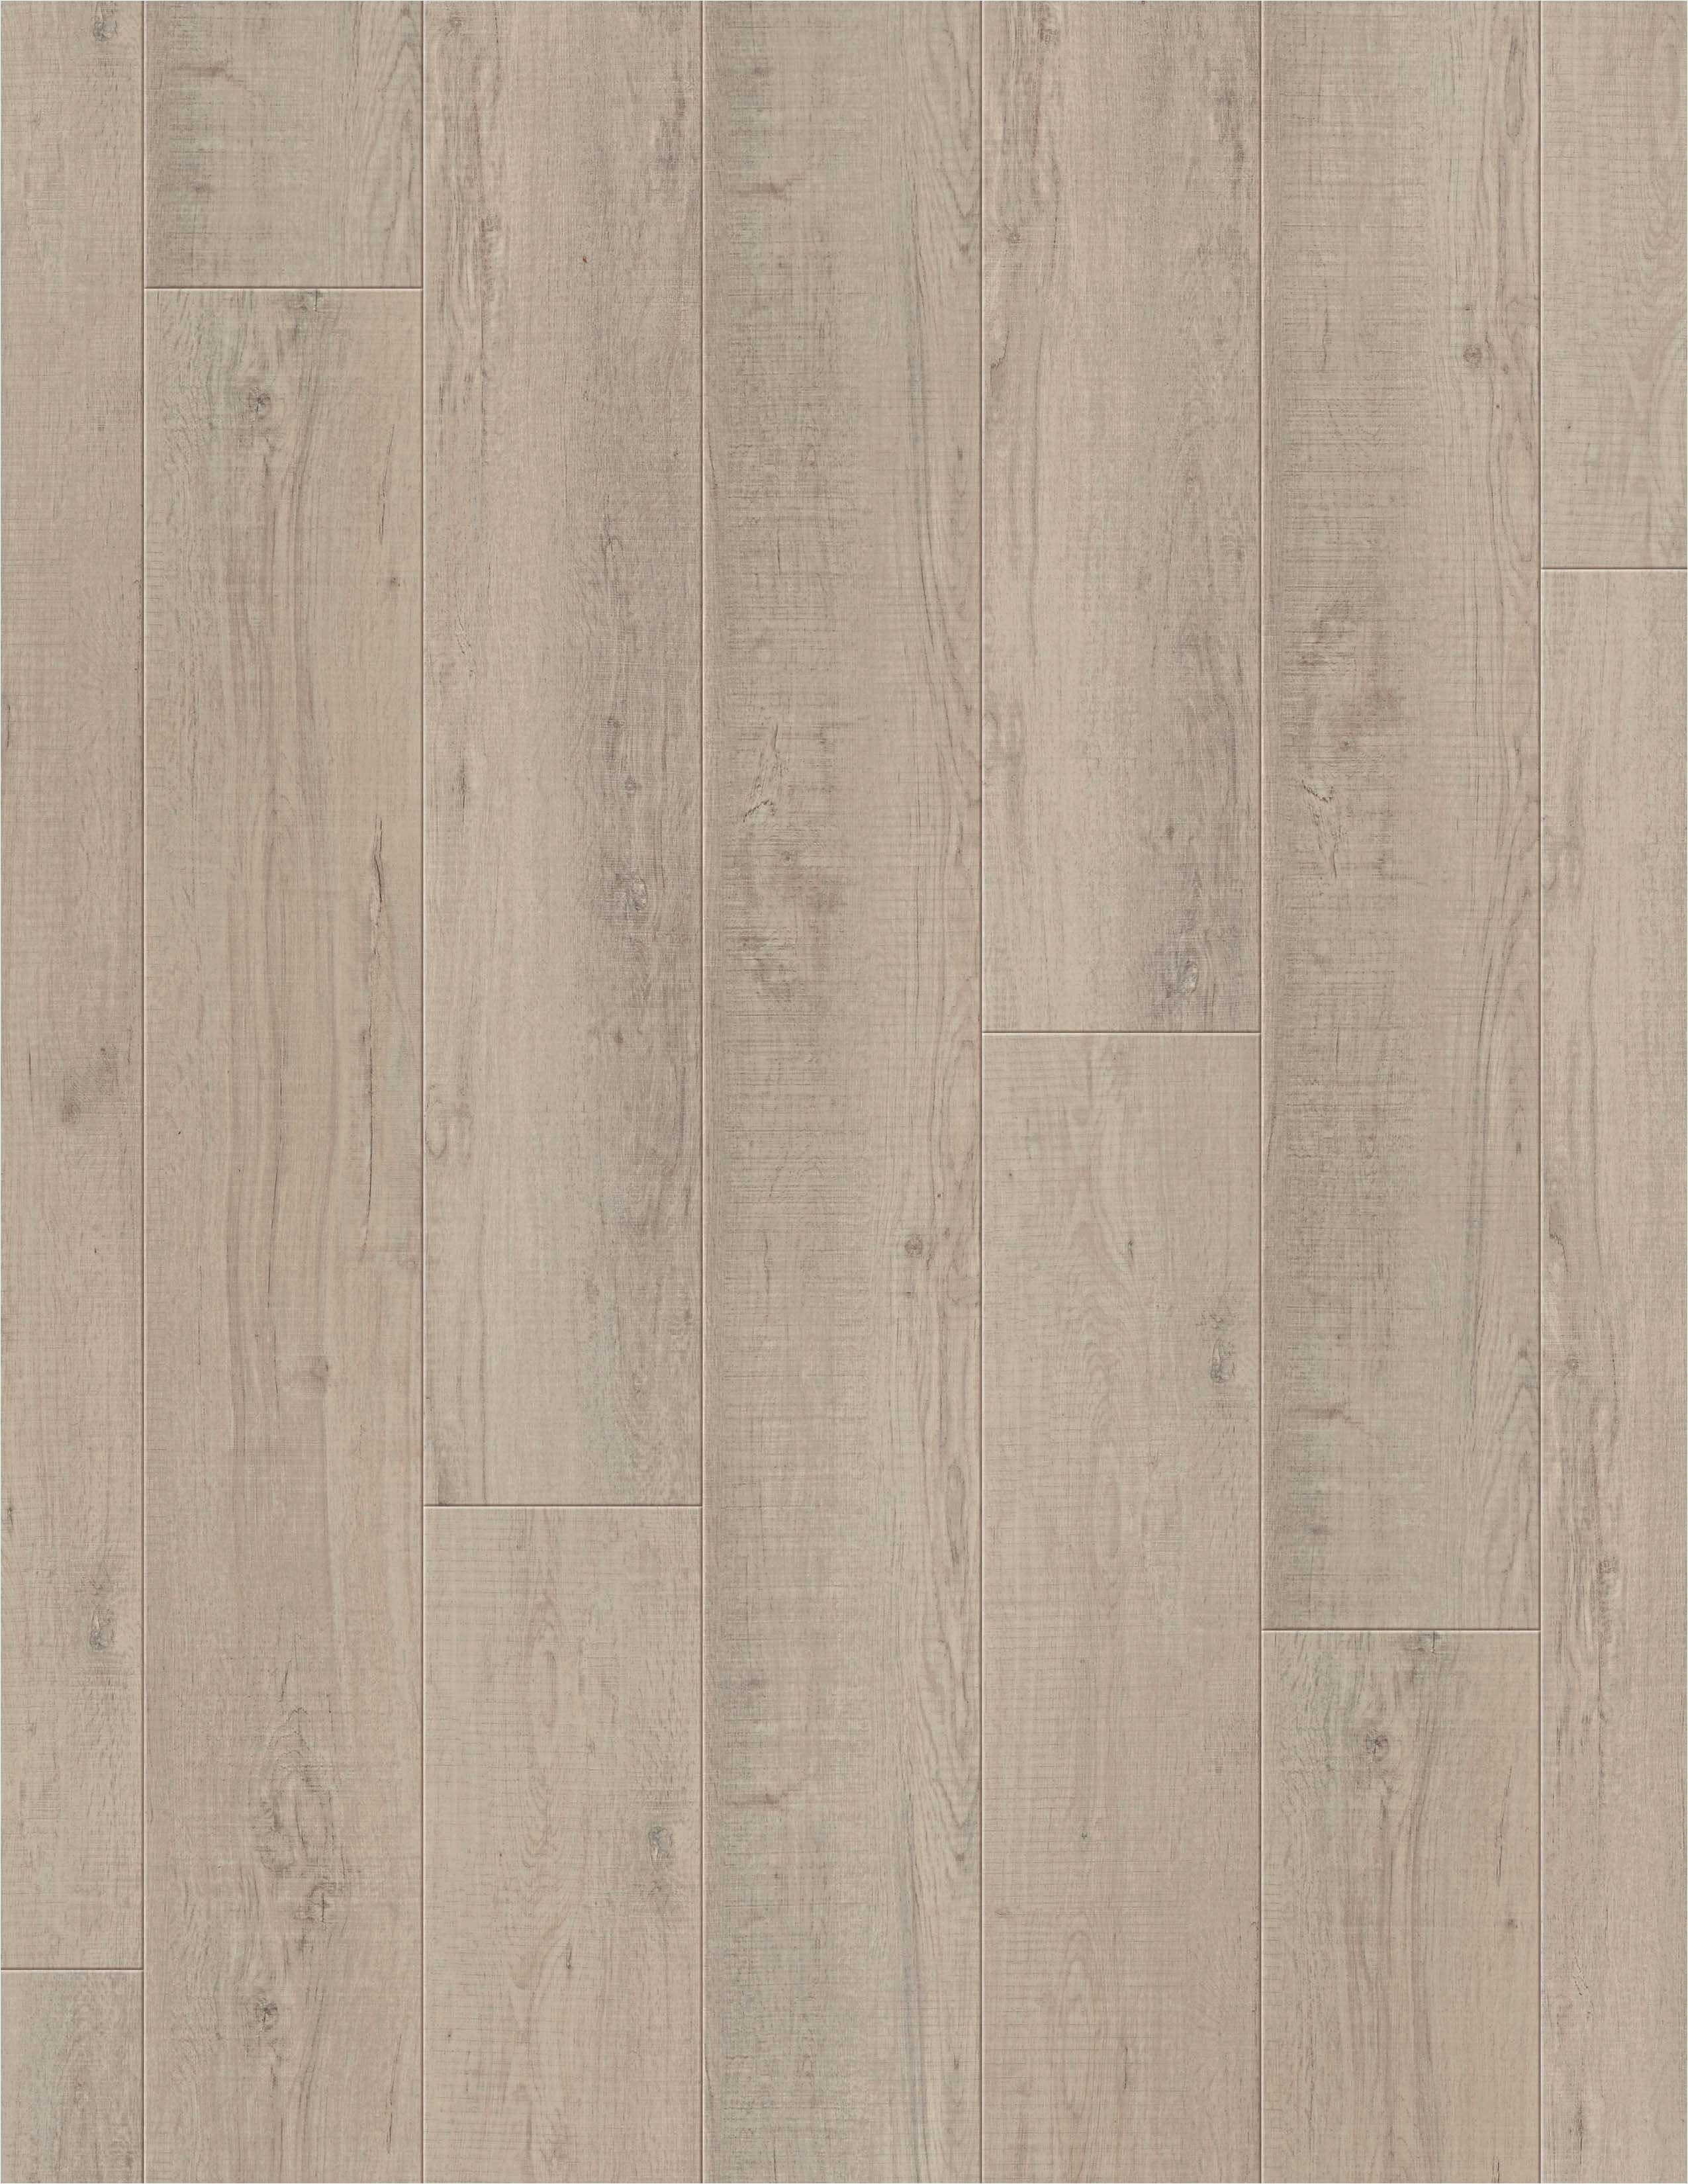 mt hardwood floors of coretec plus hd flooring coretec plus xl enhanced hayes oak flooring intended for coretec plus hd flooring coretec plus xl enhanced hayes oak flooring pinterest